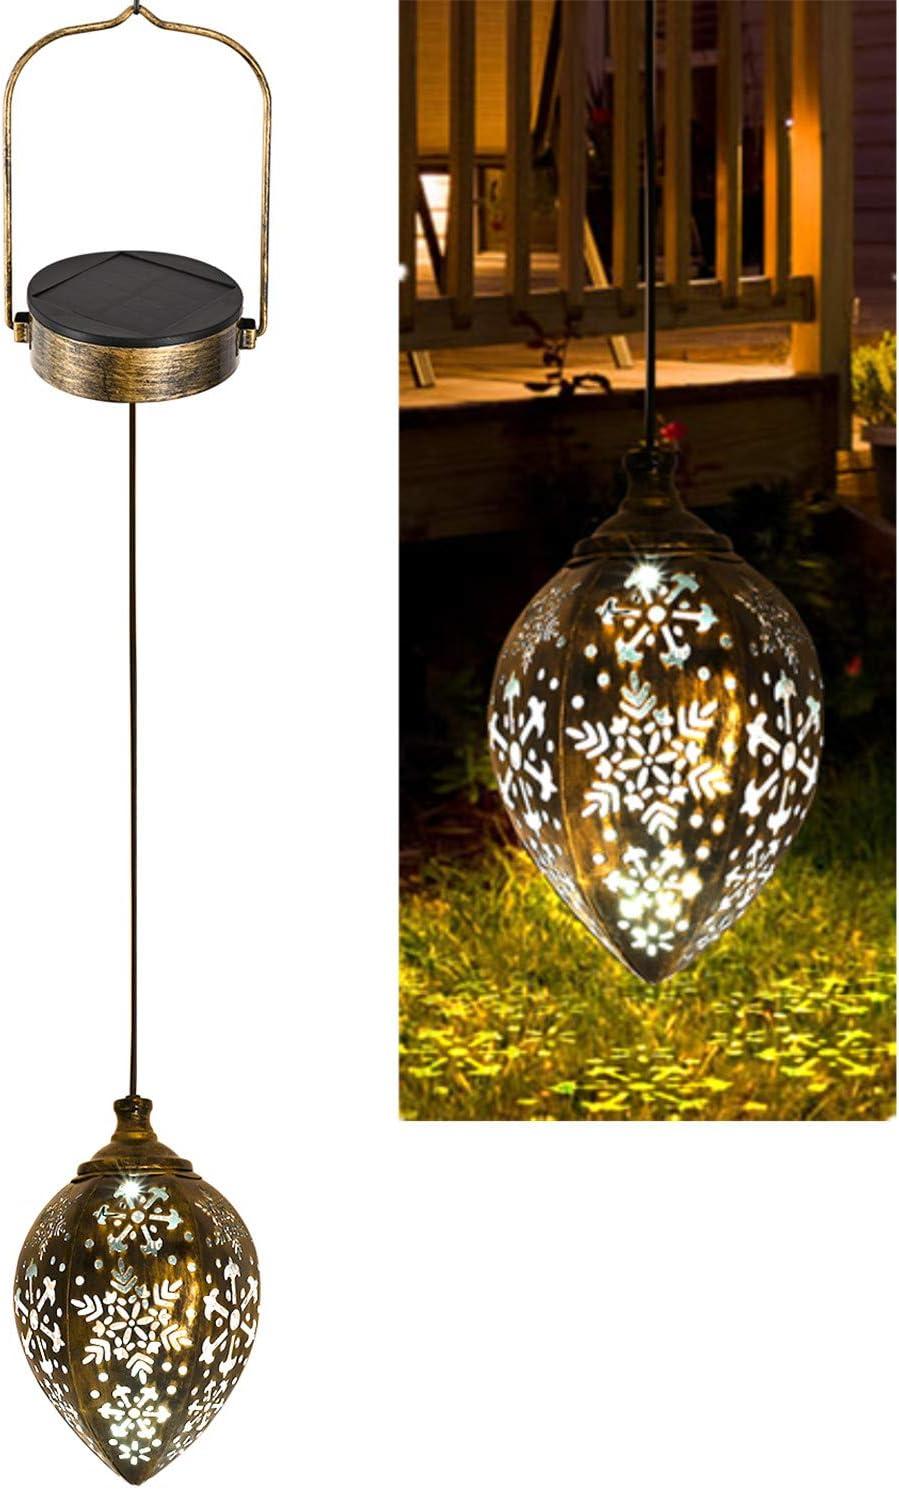 Sunklly Hanging Solar Lights Outdoor Metal Solar Lanterns Hanging Lanterns Garden Decorative Lights for Parch Hanging Solar Lamp for Lawn Pathway Backyard (1 Pack)